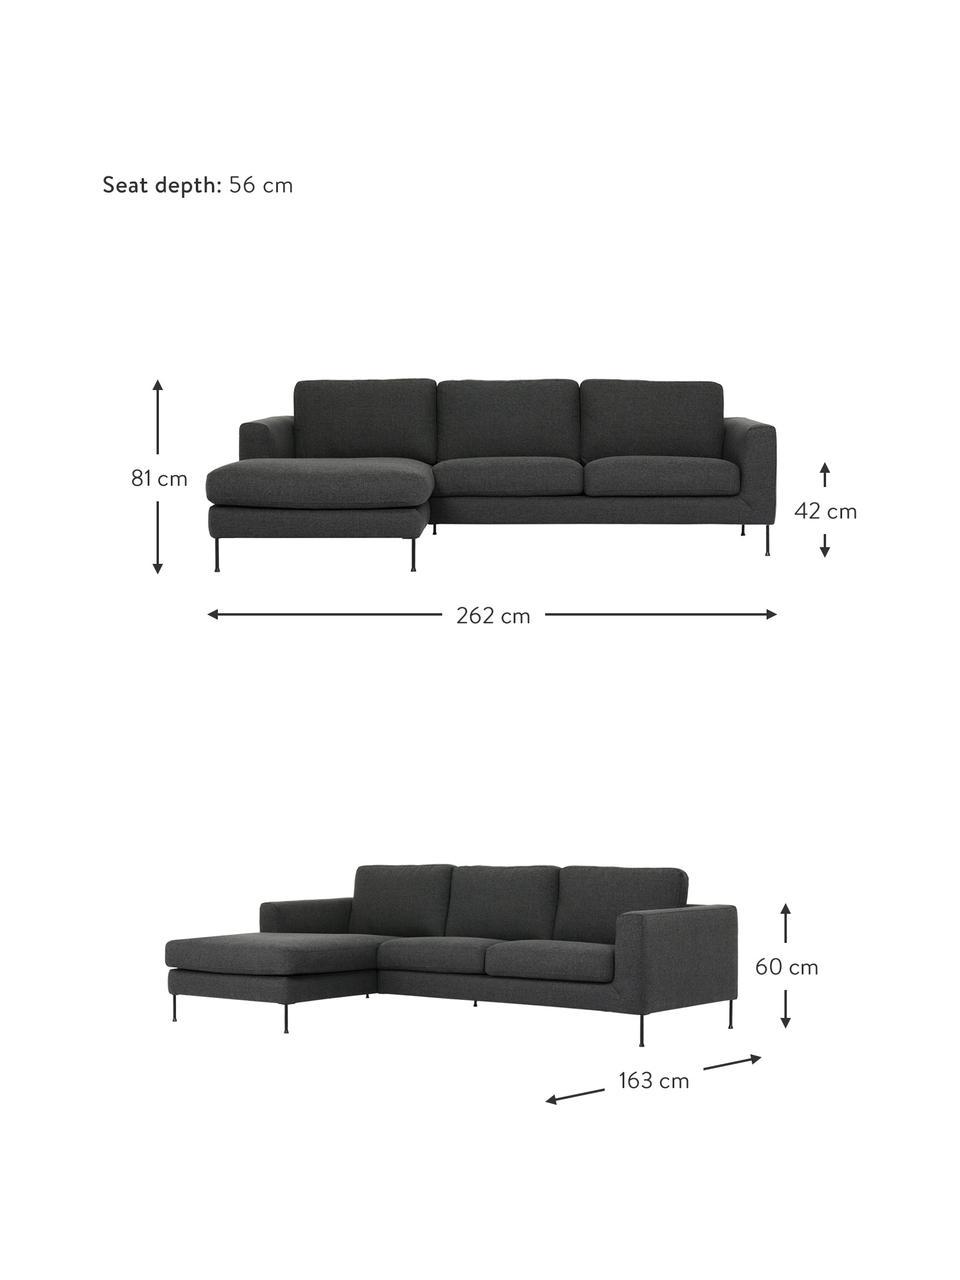 Canapé d'angle 3places anthracite Cucita, Tissu anthracite